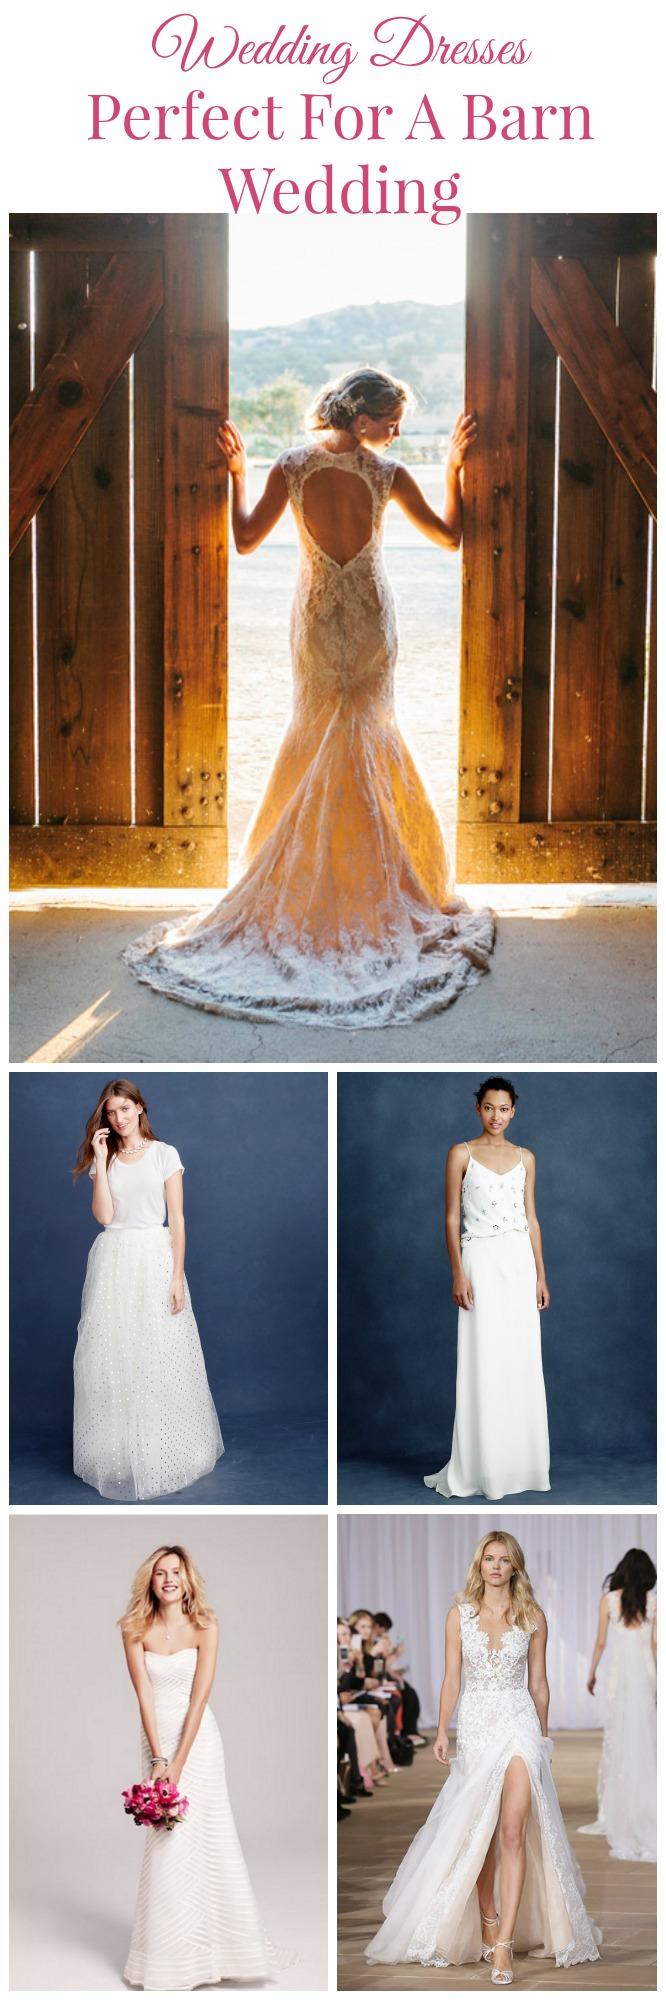 7 wedding dresses perfect for a barn wedding rustic for Dress for barn wedding